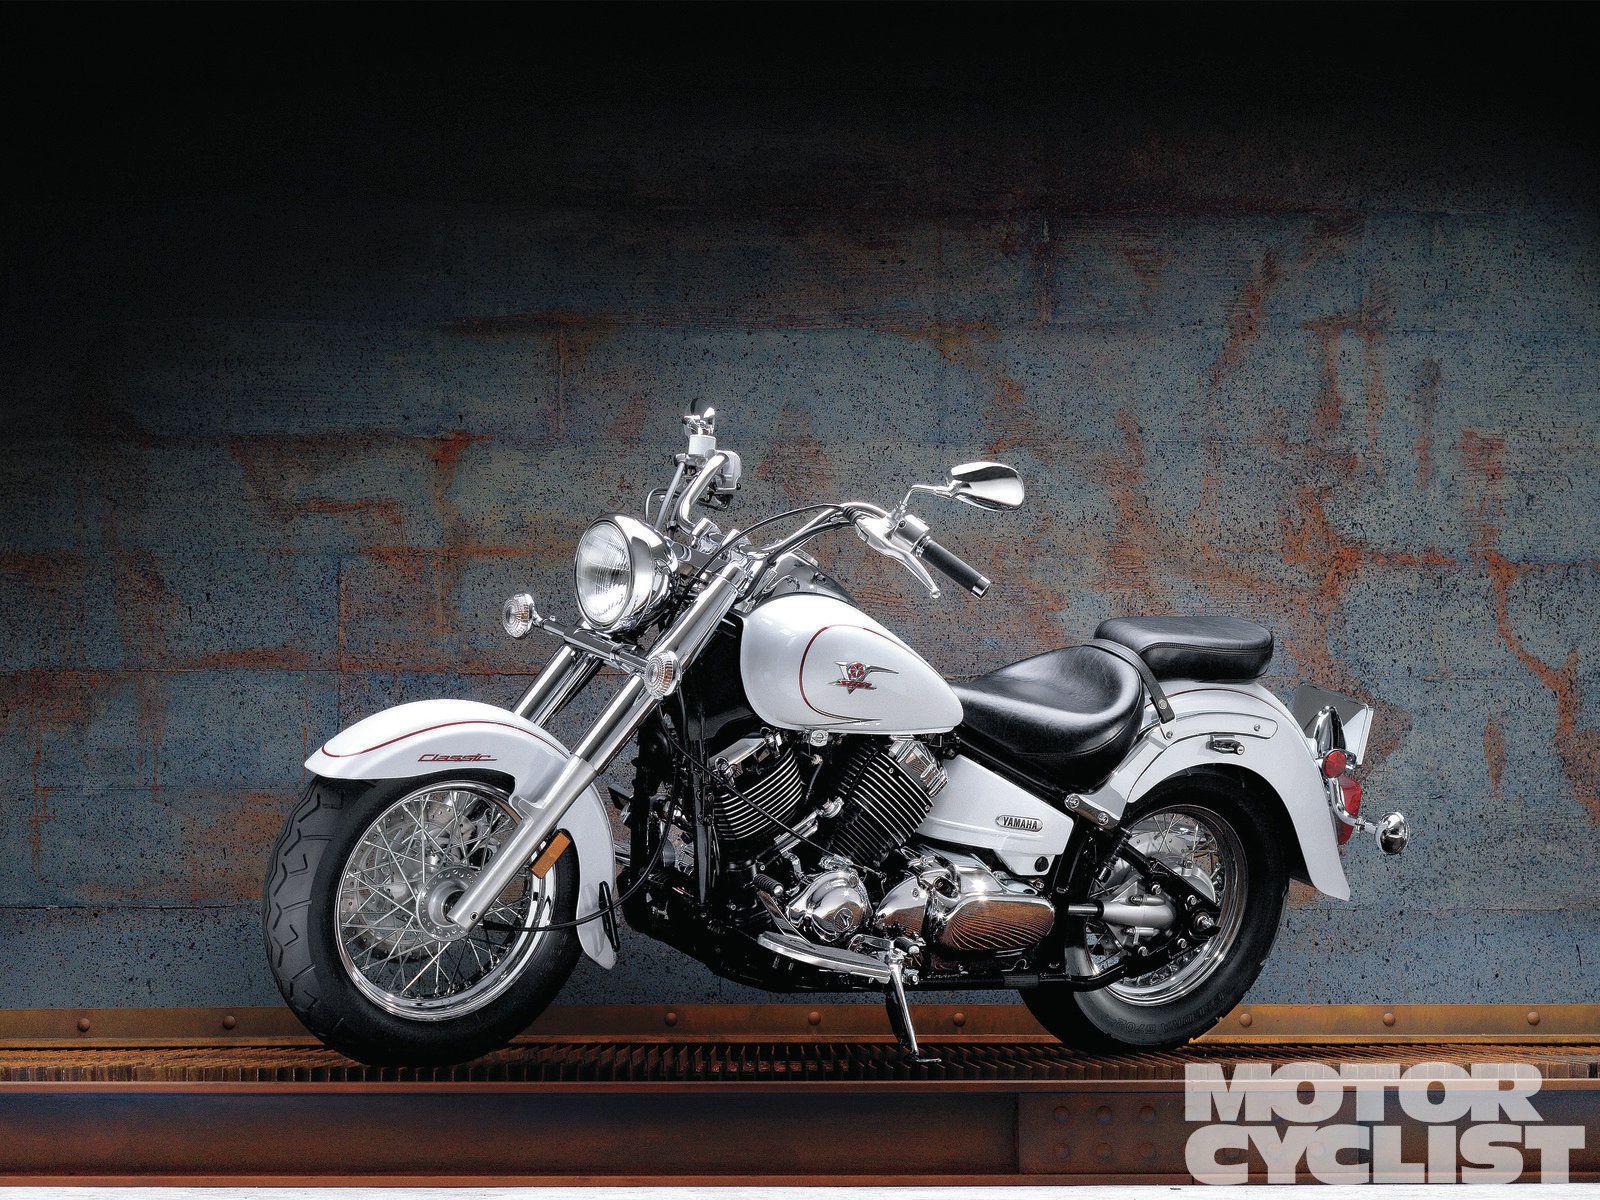 2006-2011 Star V Star 650 | Motorcyclist